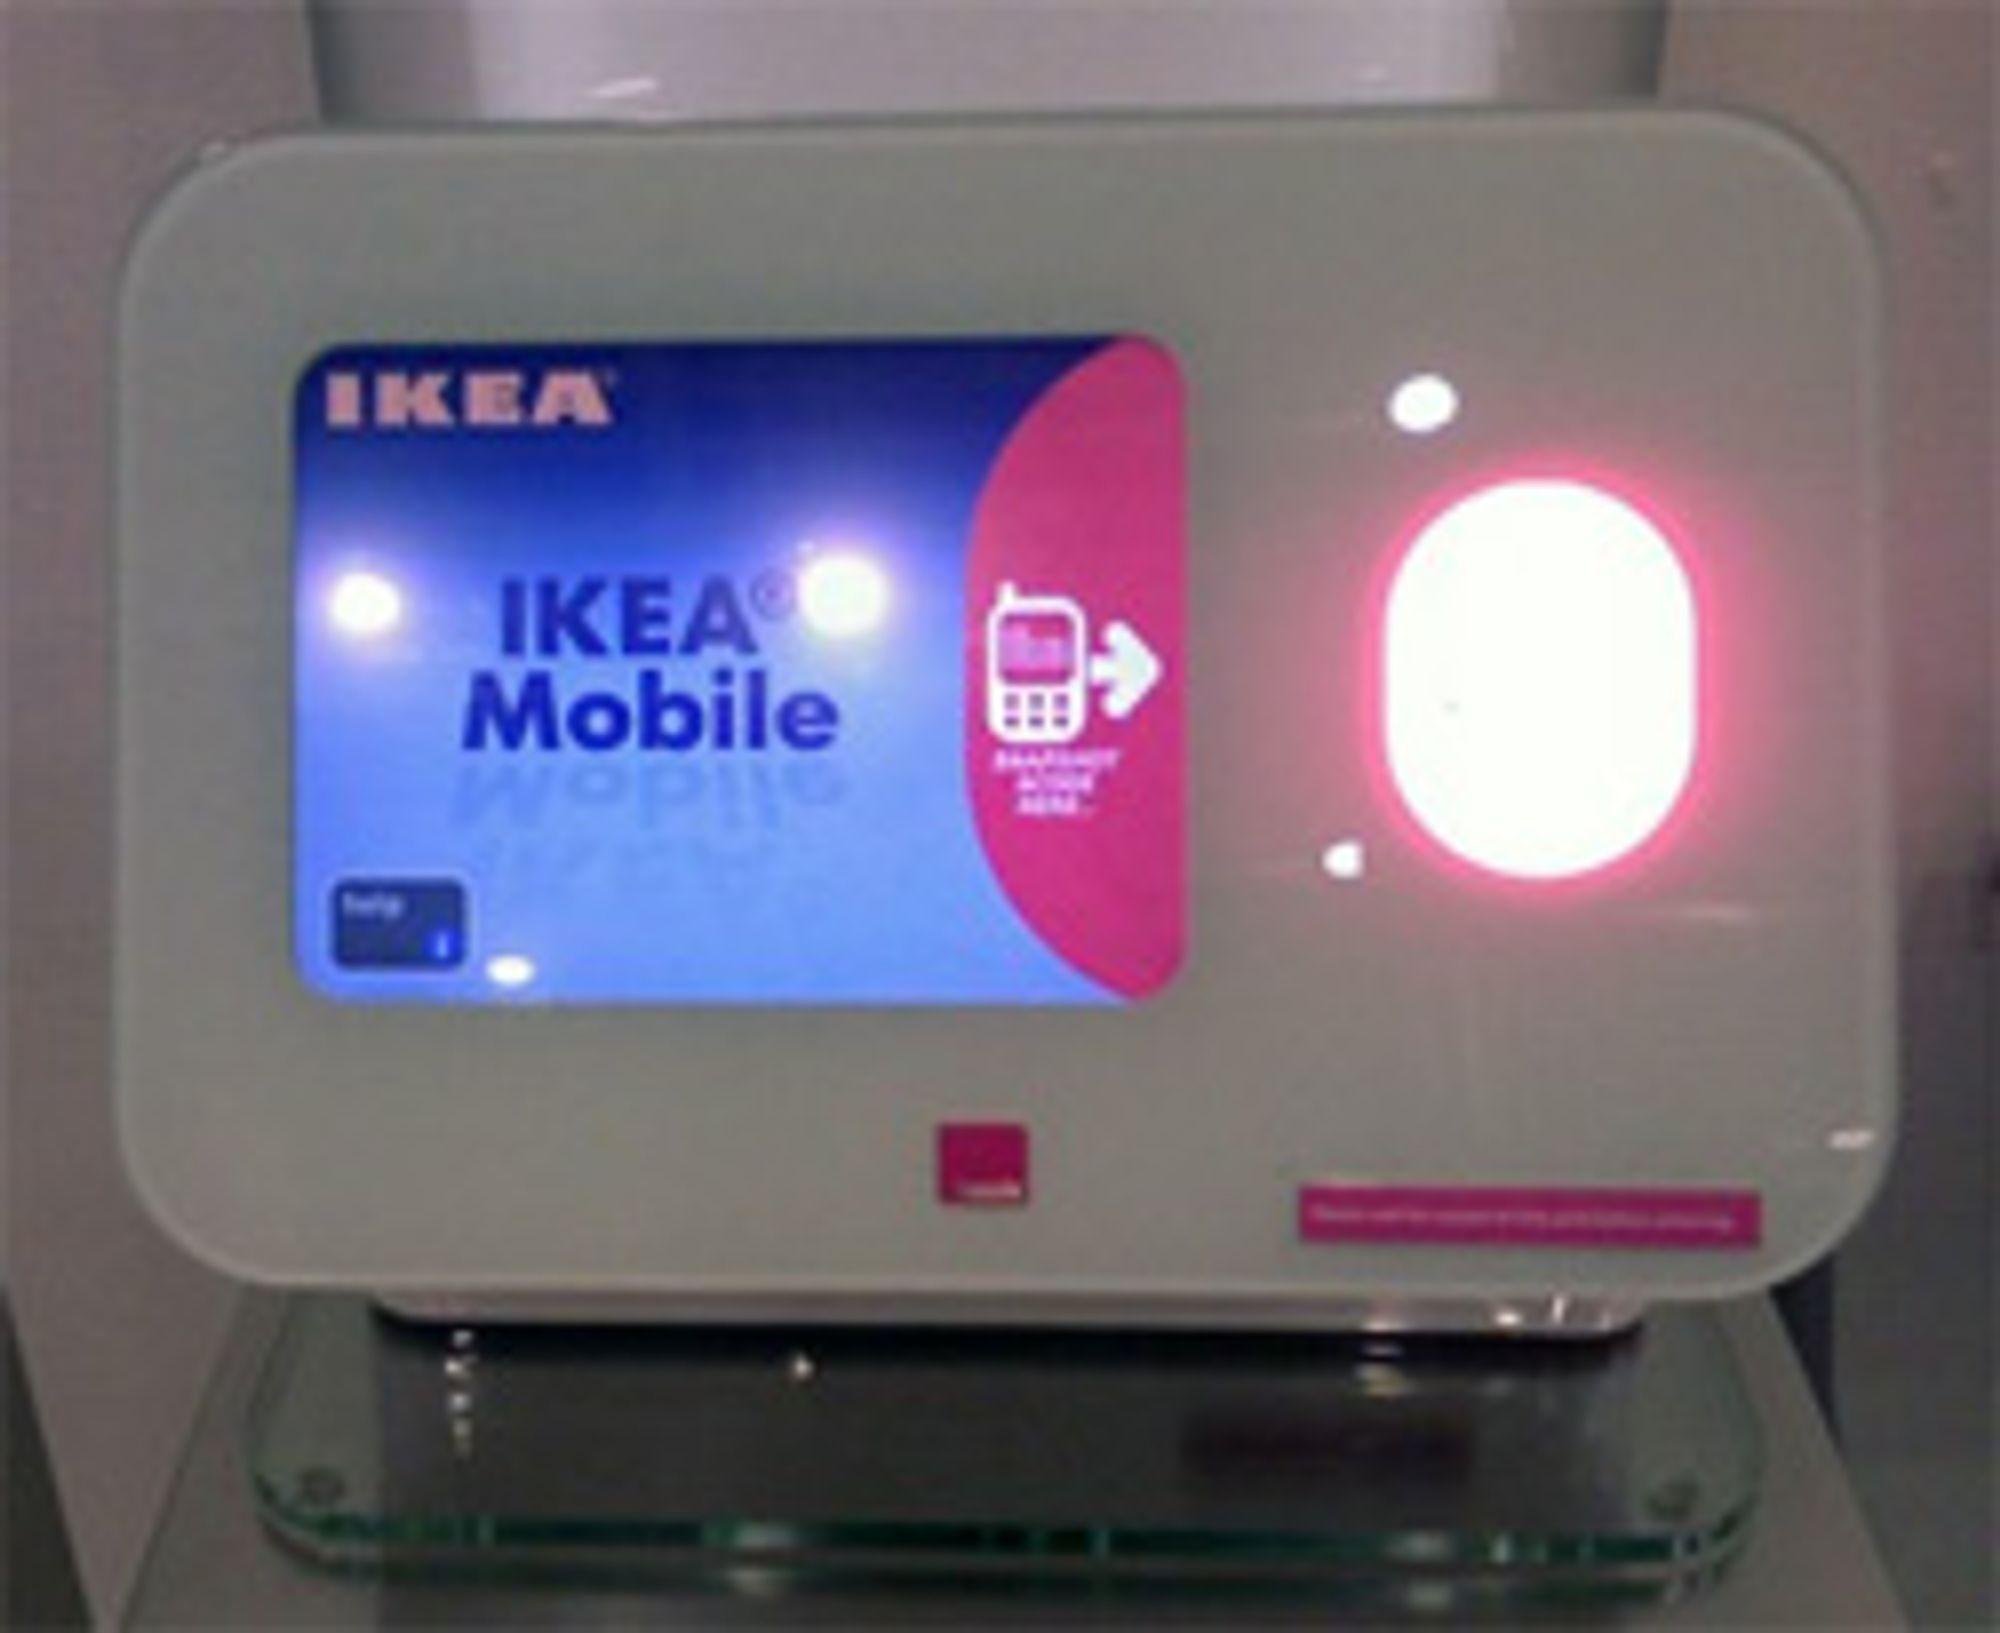 Den nye Ikea-automaten. (Foto: Apartment Therapy Unplugged)